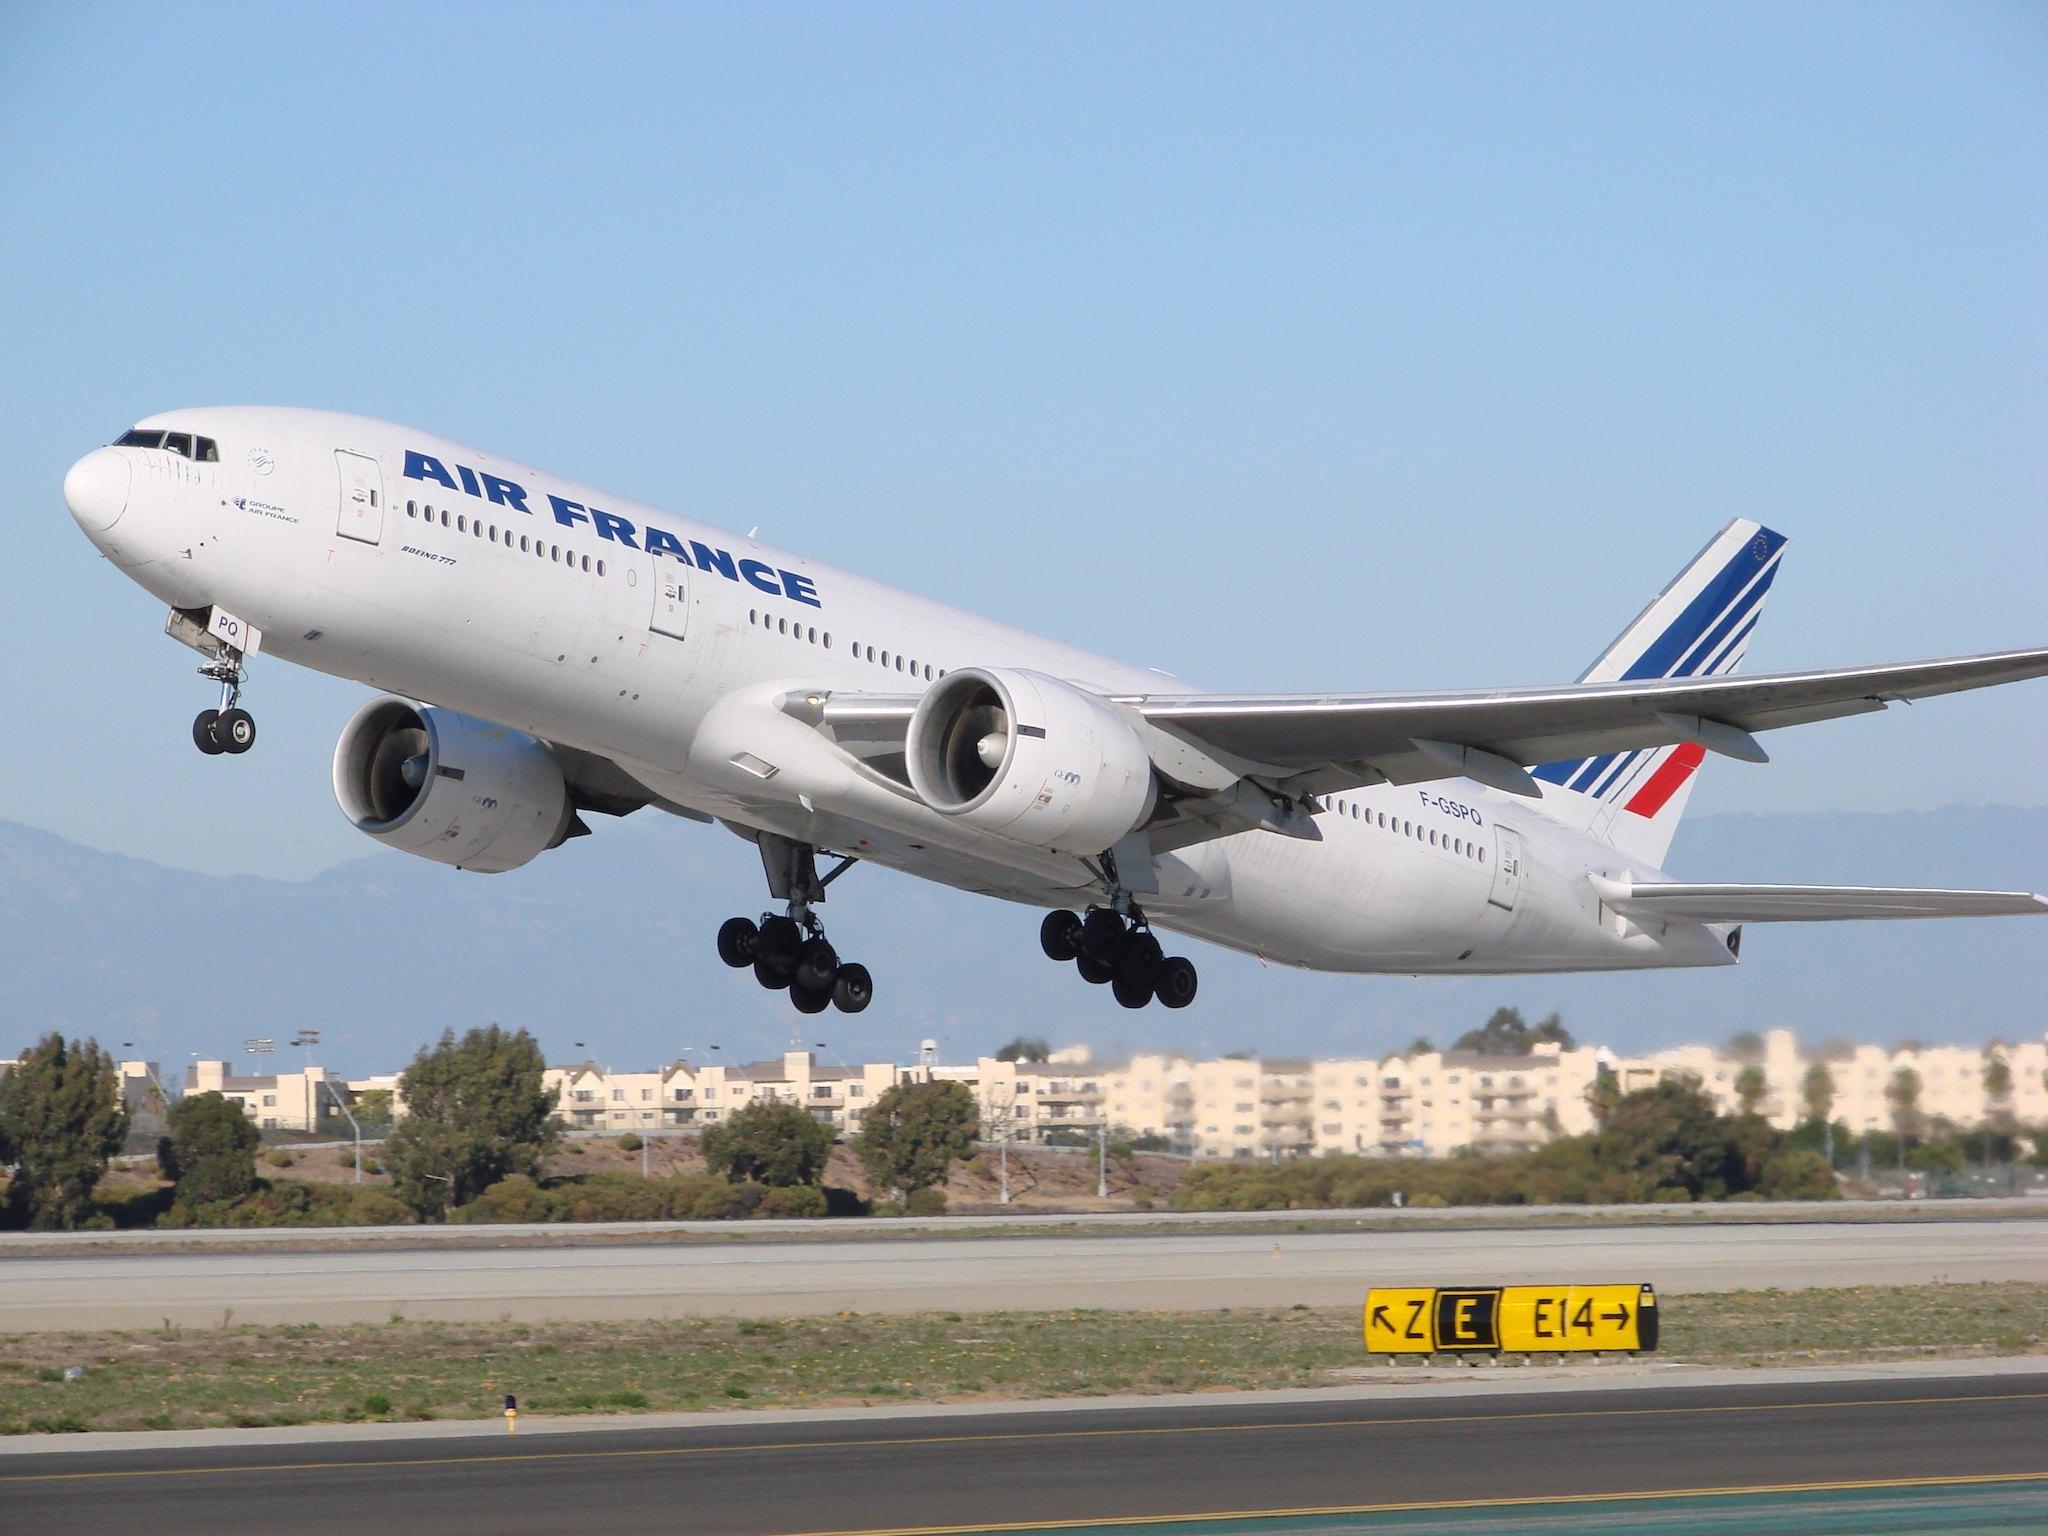 Nouvelle liaison quotidienne air france de paris orly new york aaf actualit - Comptoir air france orly telephone ...